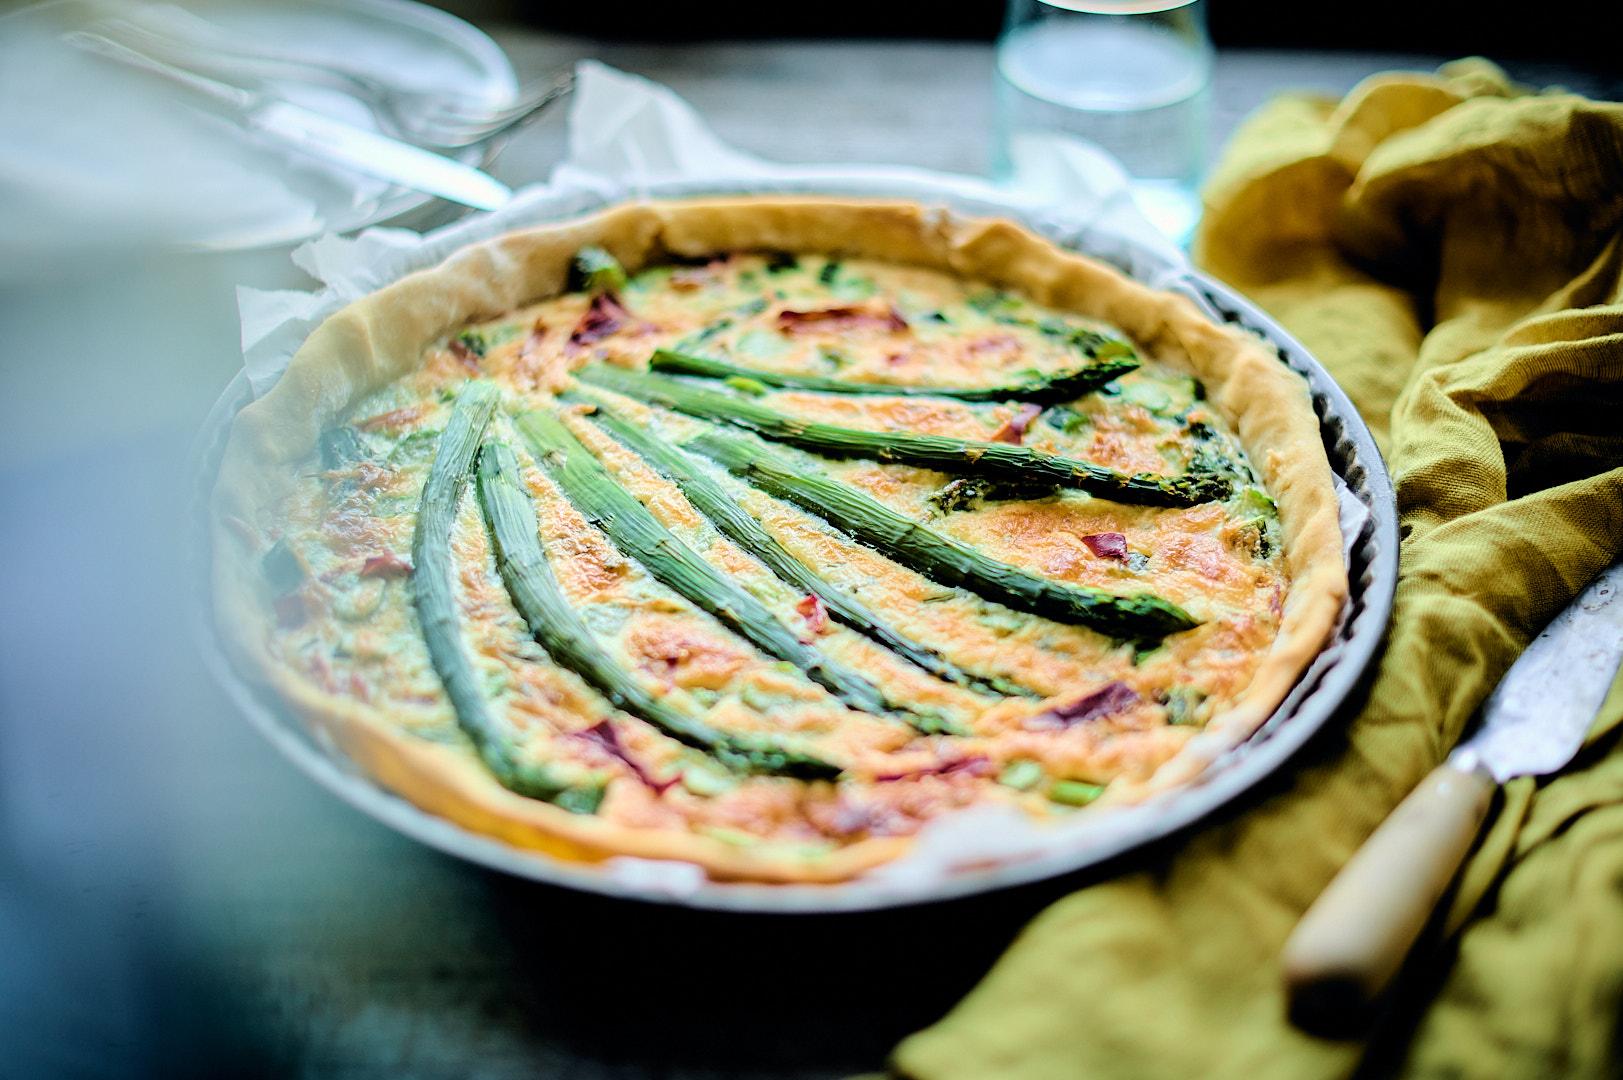 Tarte asperges & jambon Serrano